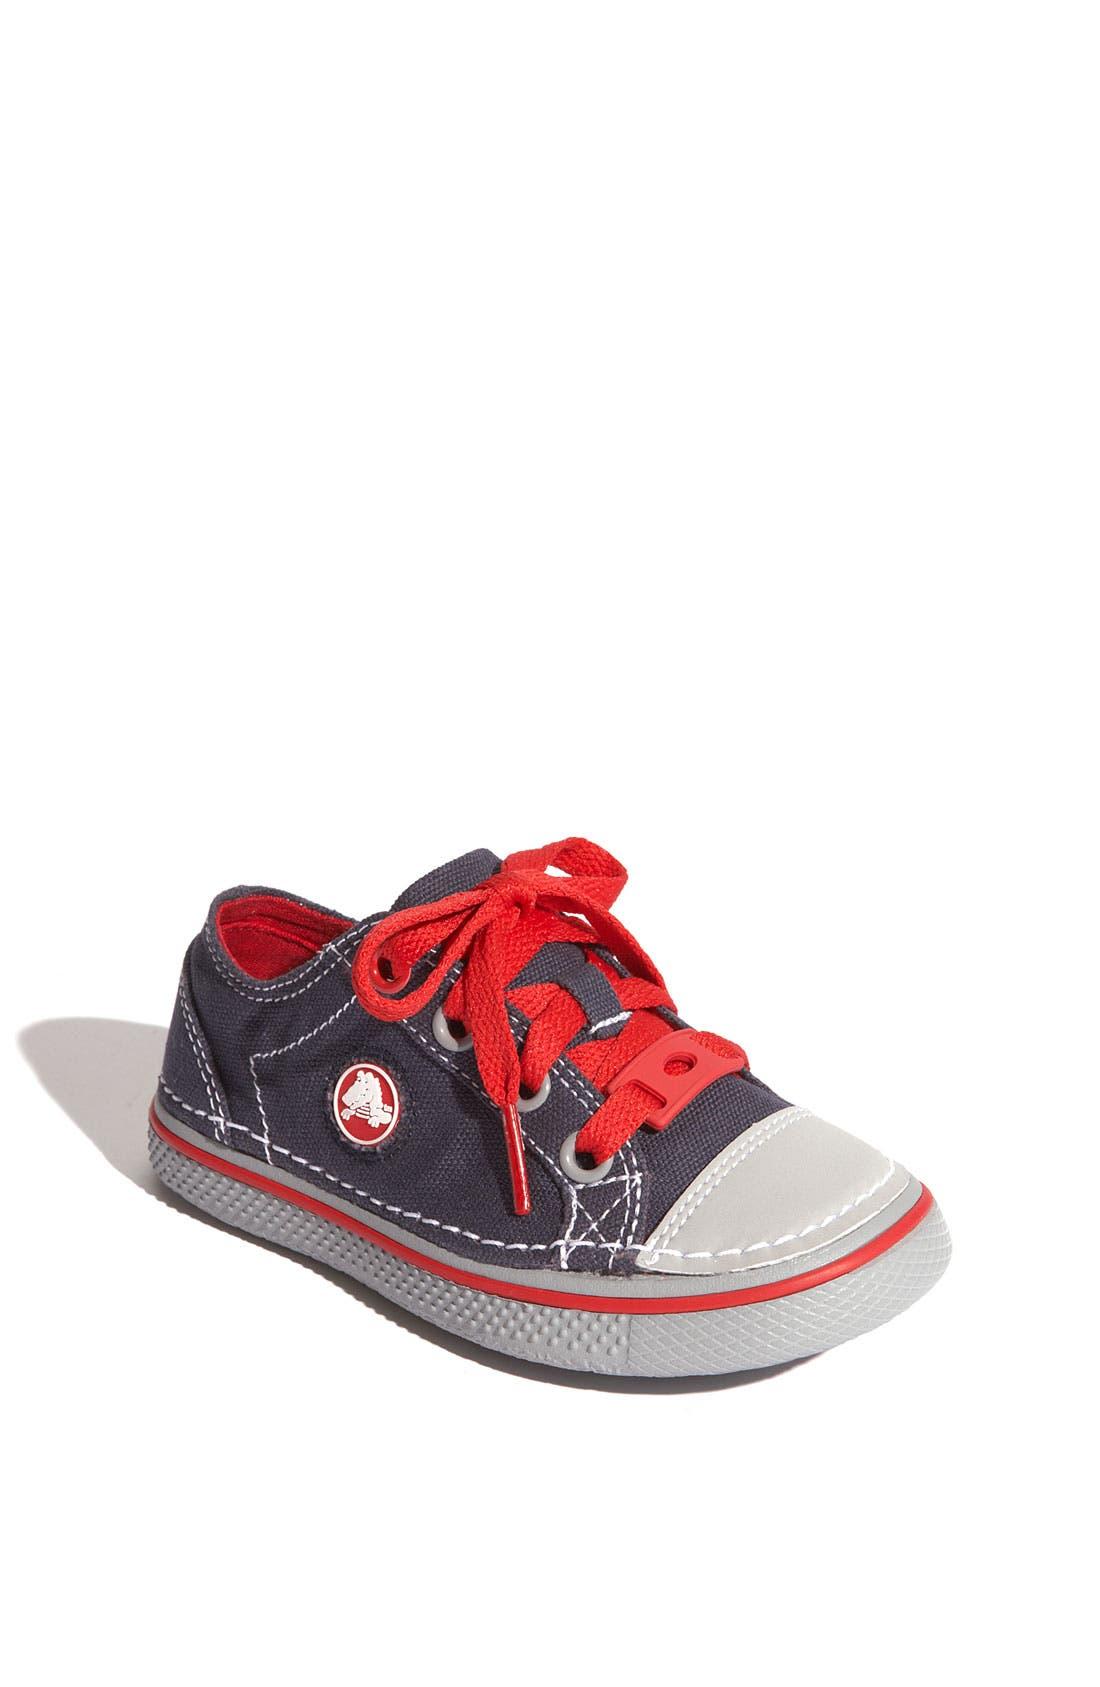 Main Image - CROCS™ 'Hover' Sneaker (Toddler, Little Kid & Big Kid)